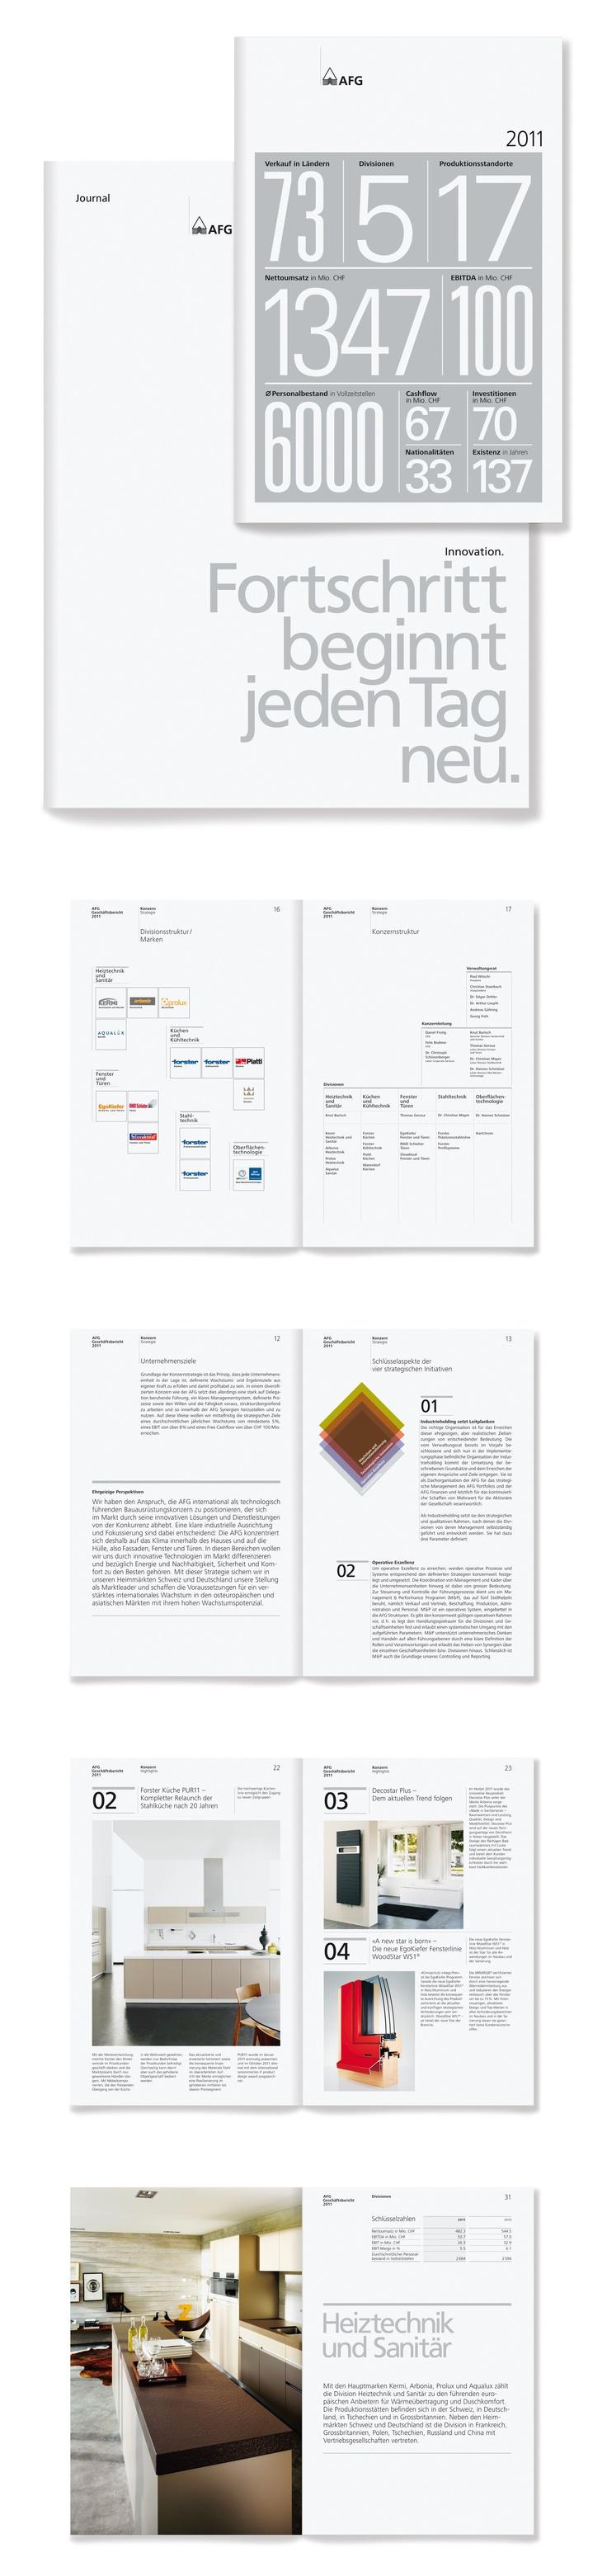 AFG Annual Report 2011    via  http://red-dot.de/cd/online-exhibition/work?code=02-1187=2012=147=0